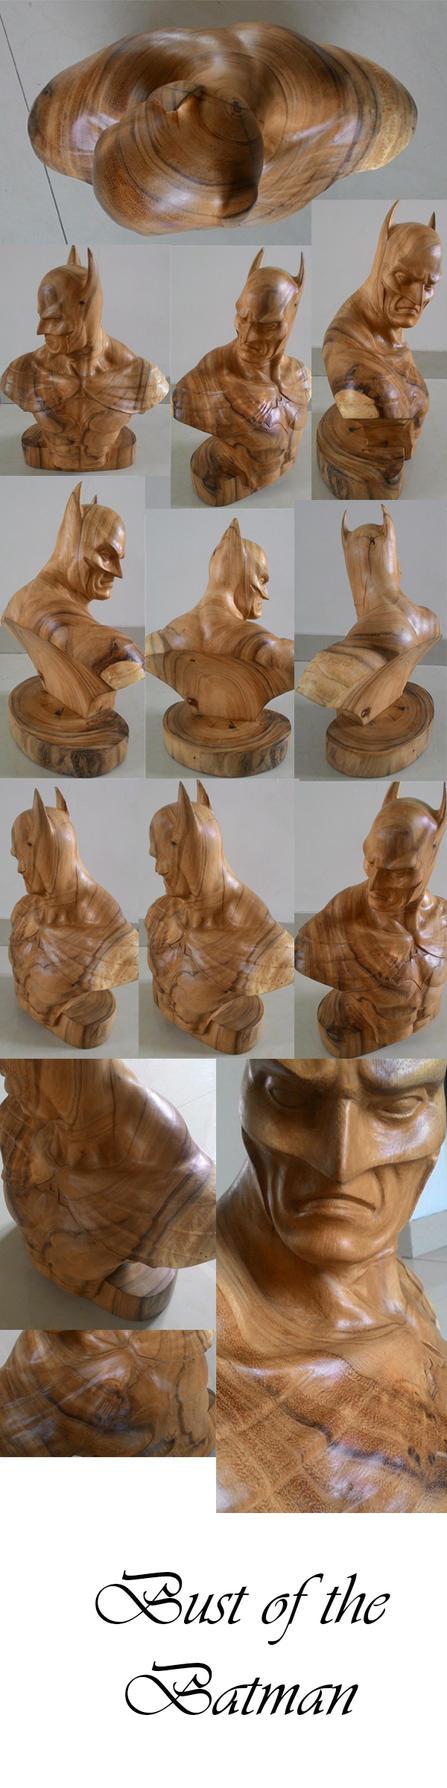 Batman bust by armb8990